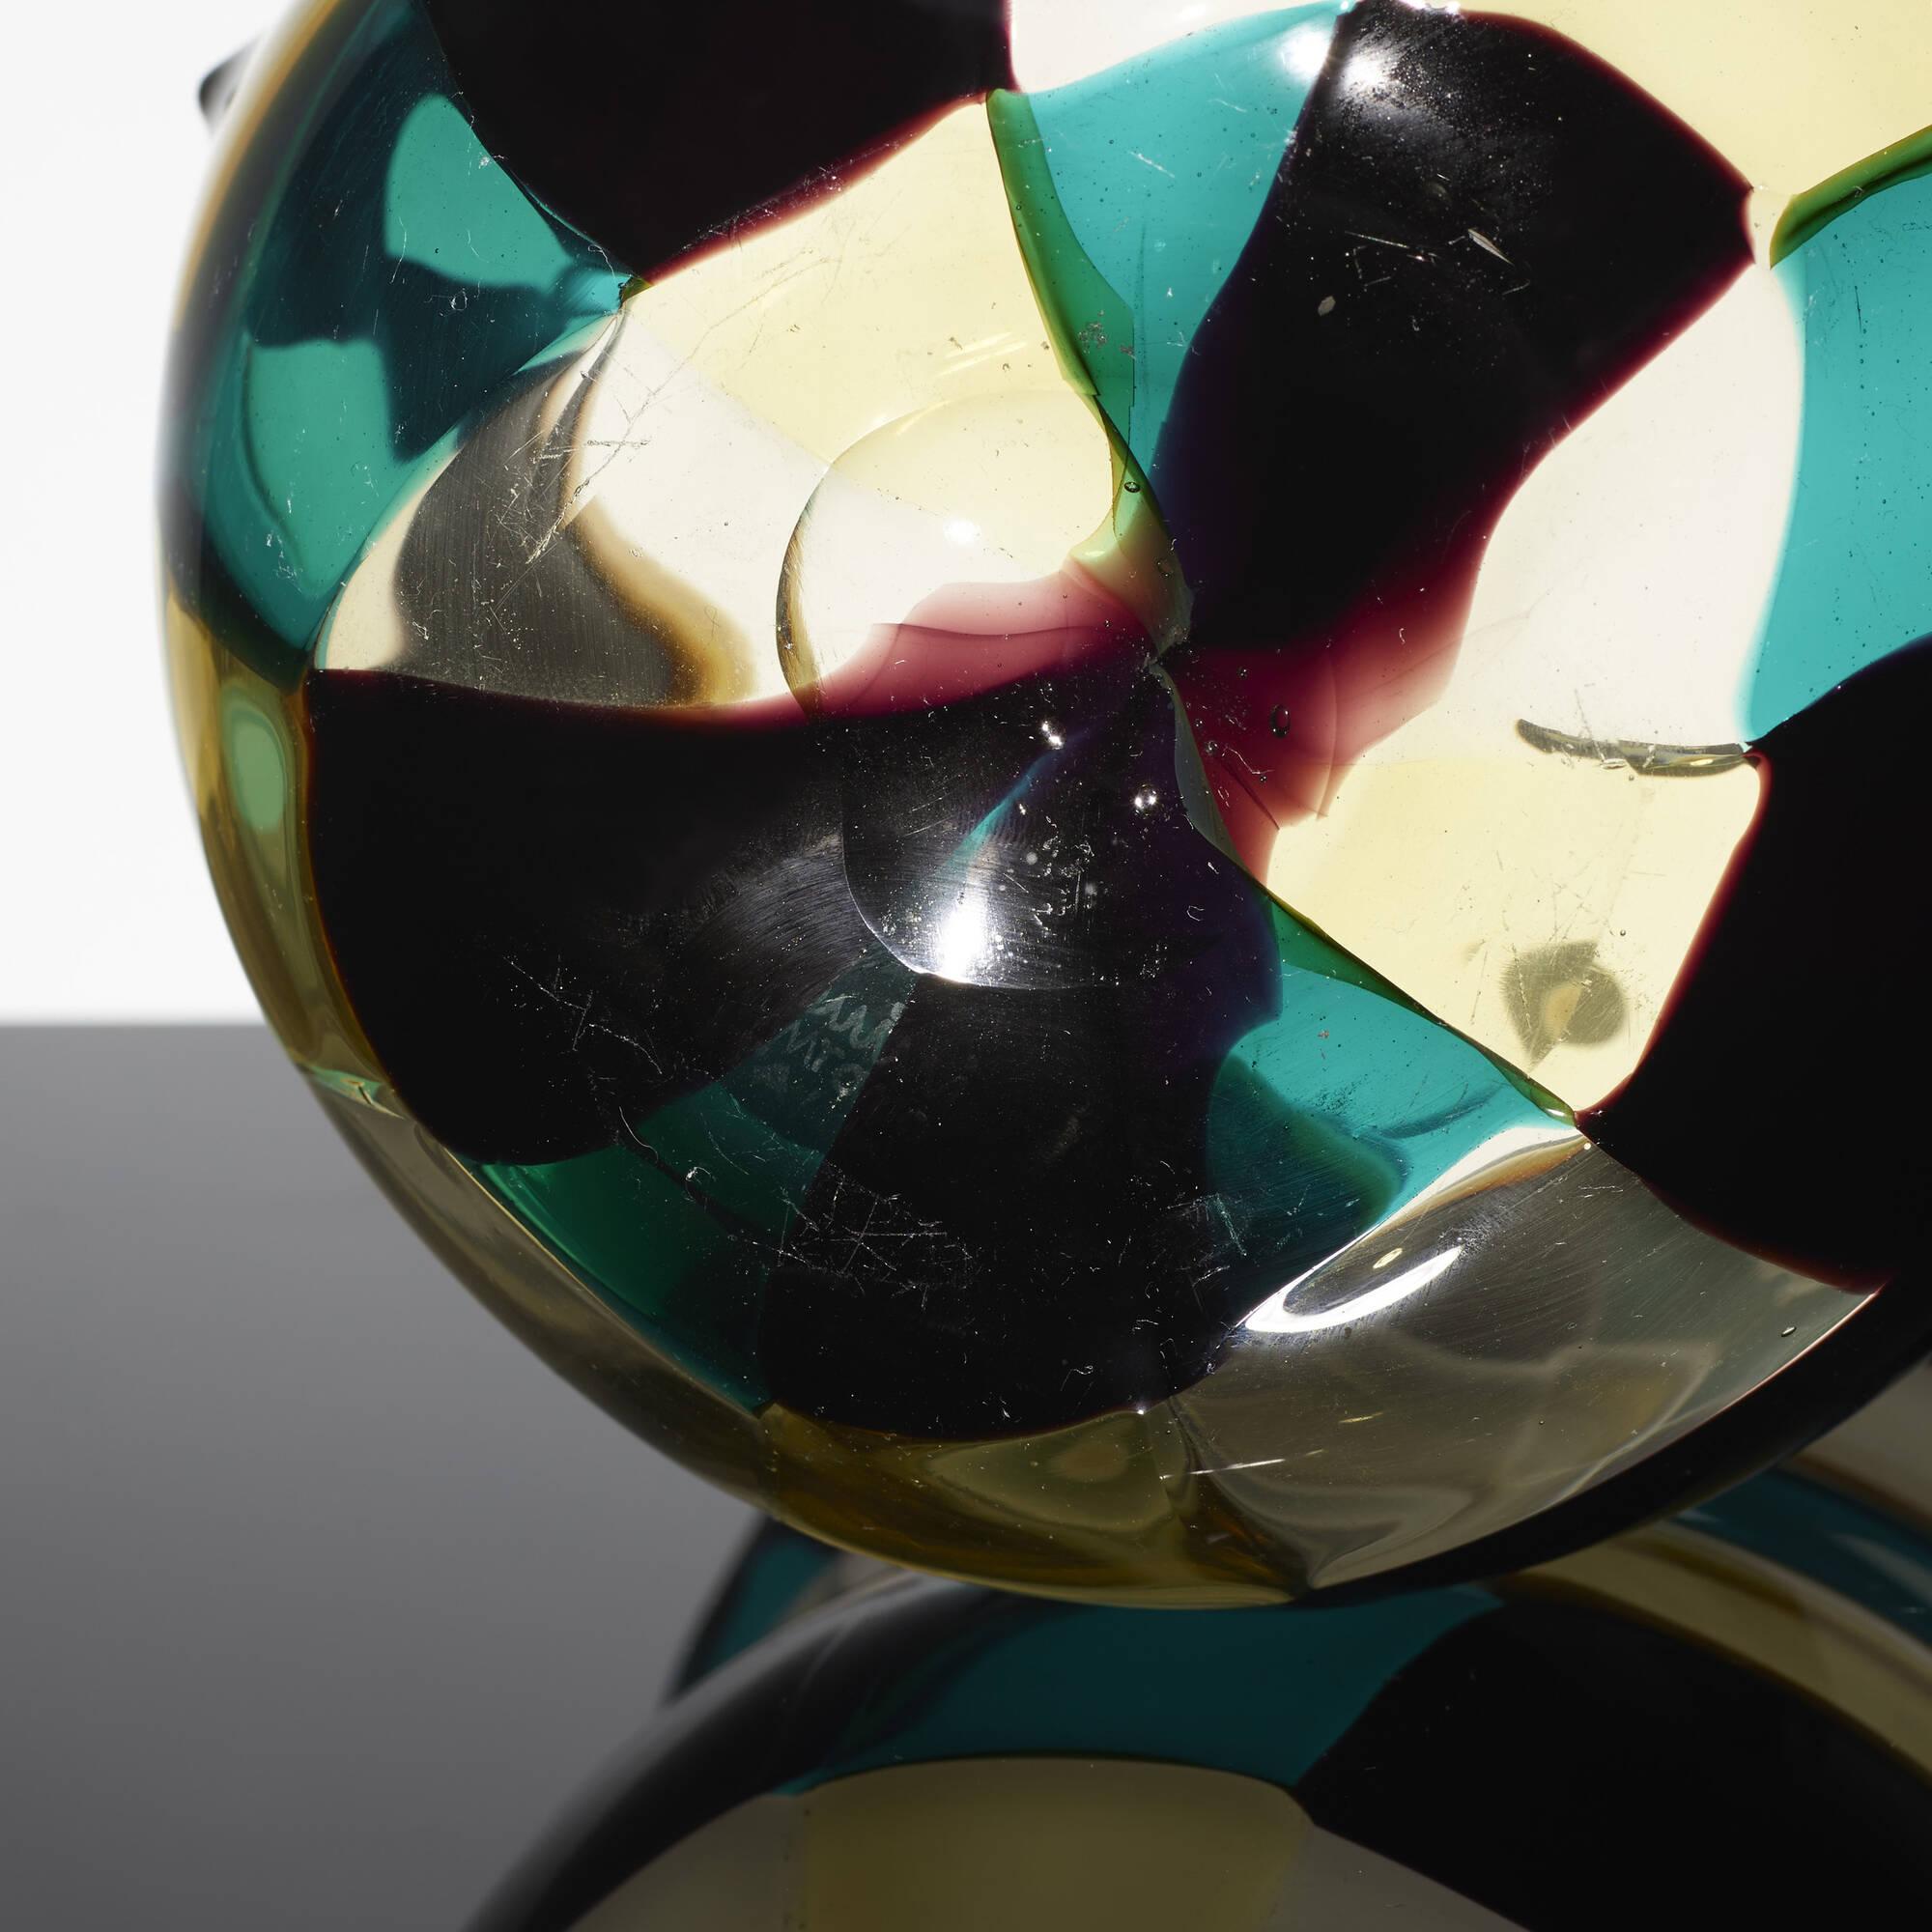 138: Fulvio Bianconi / Pezzato vase (3 of 3)